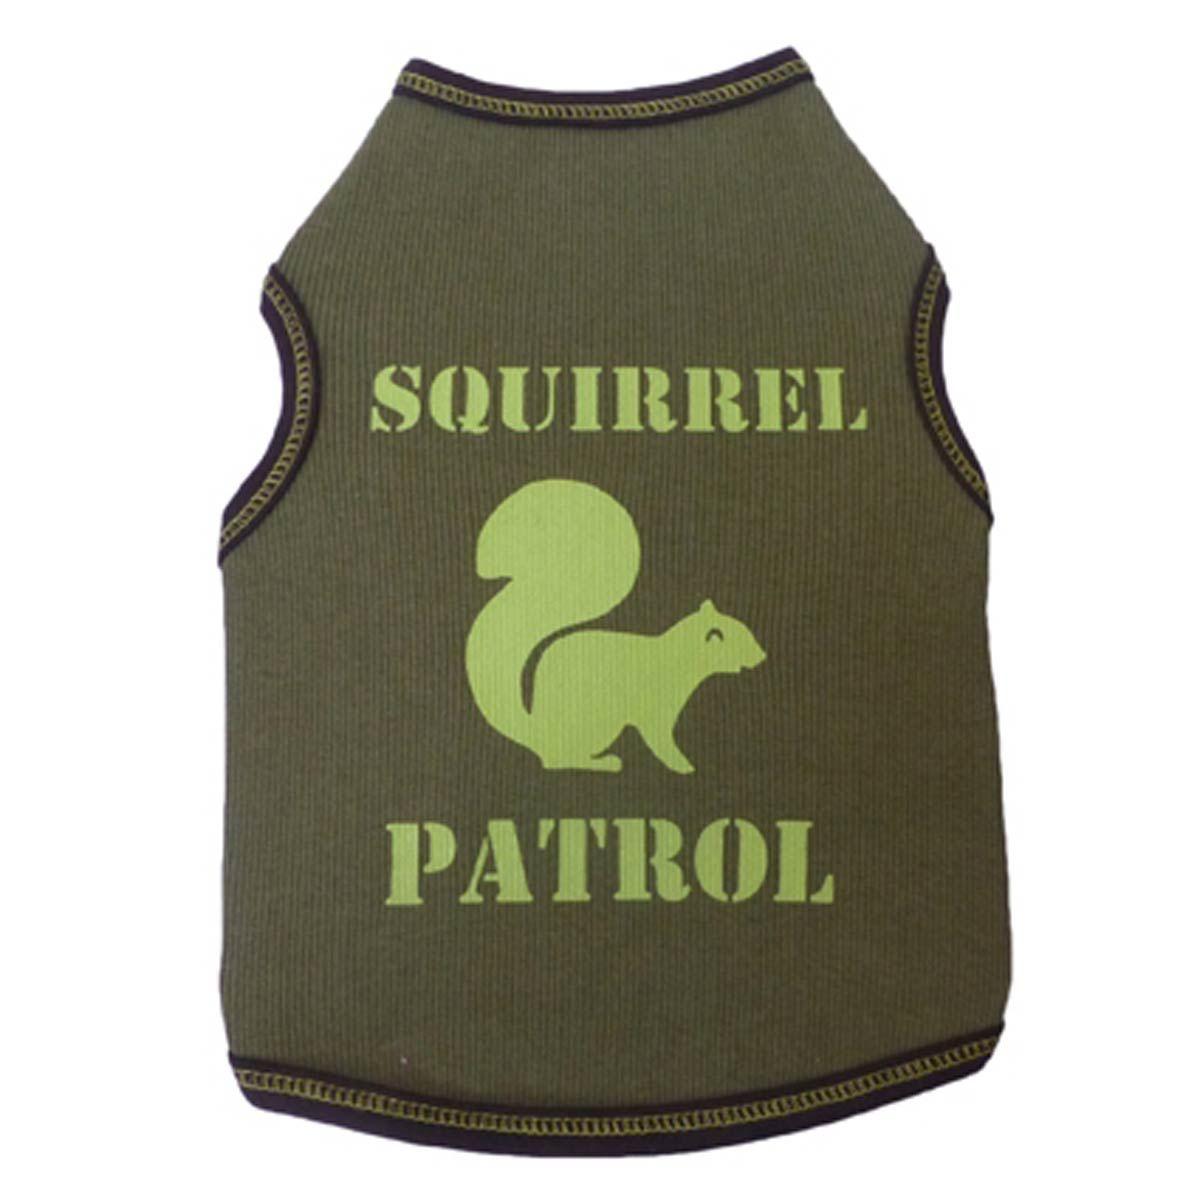 Squirrel Patrol Dog Tank Green Squirrel Dog Shirt Dogs